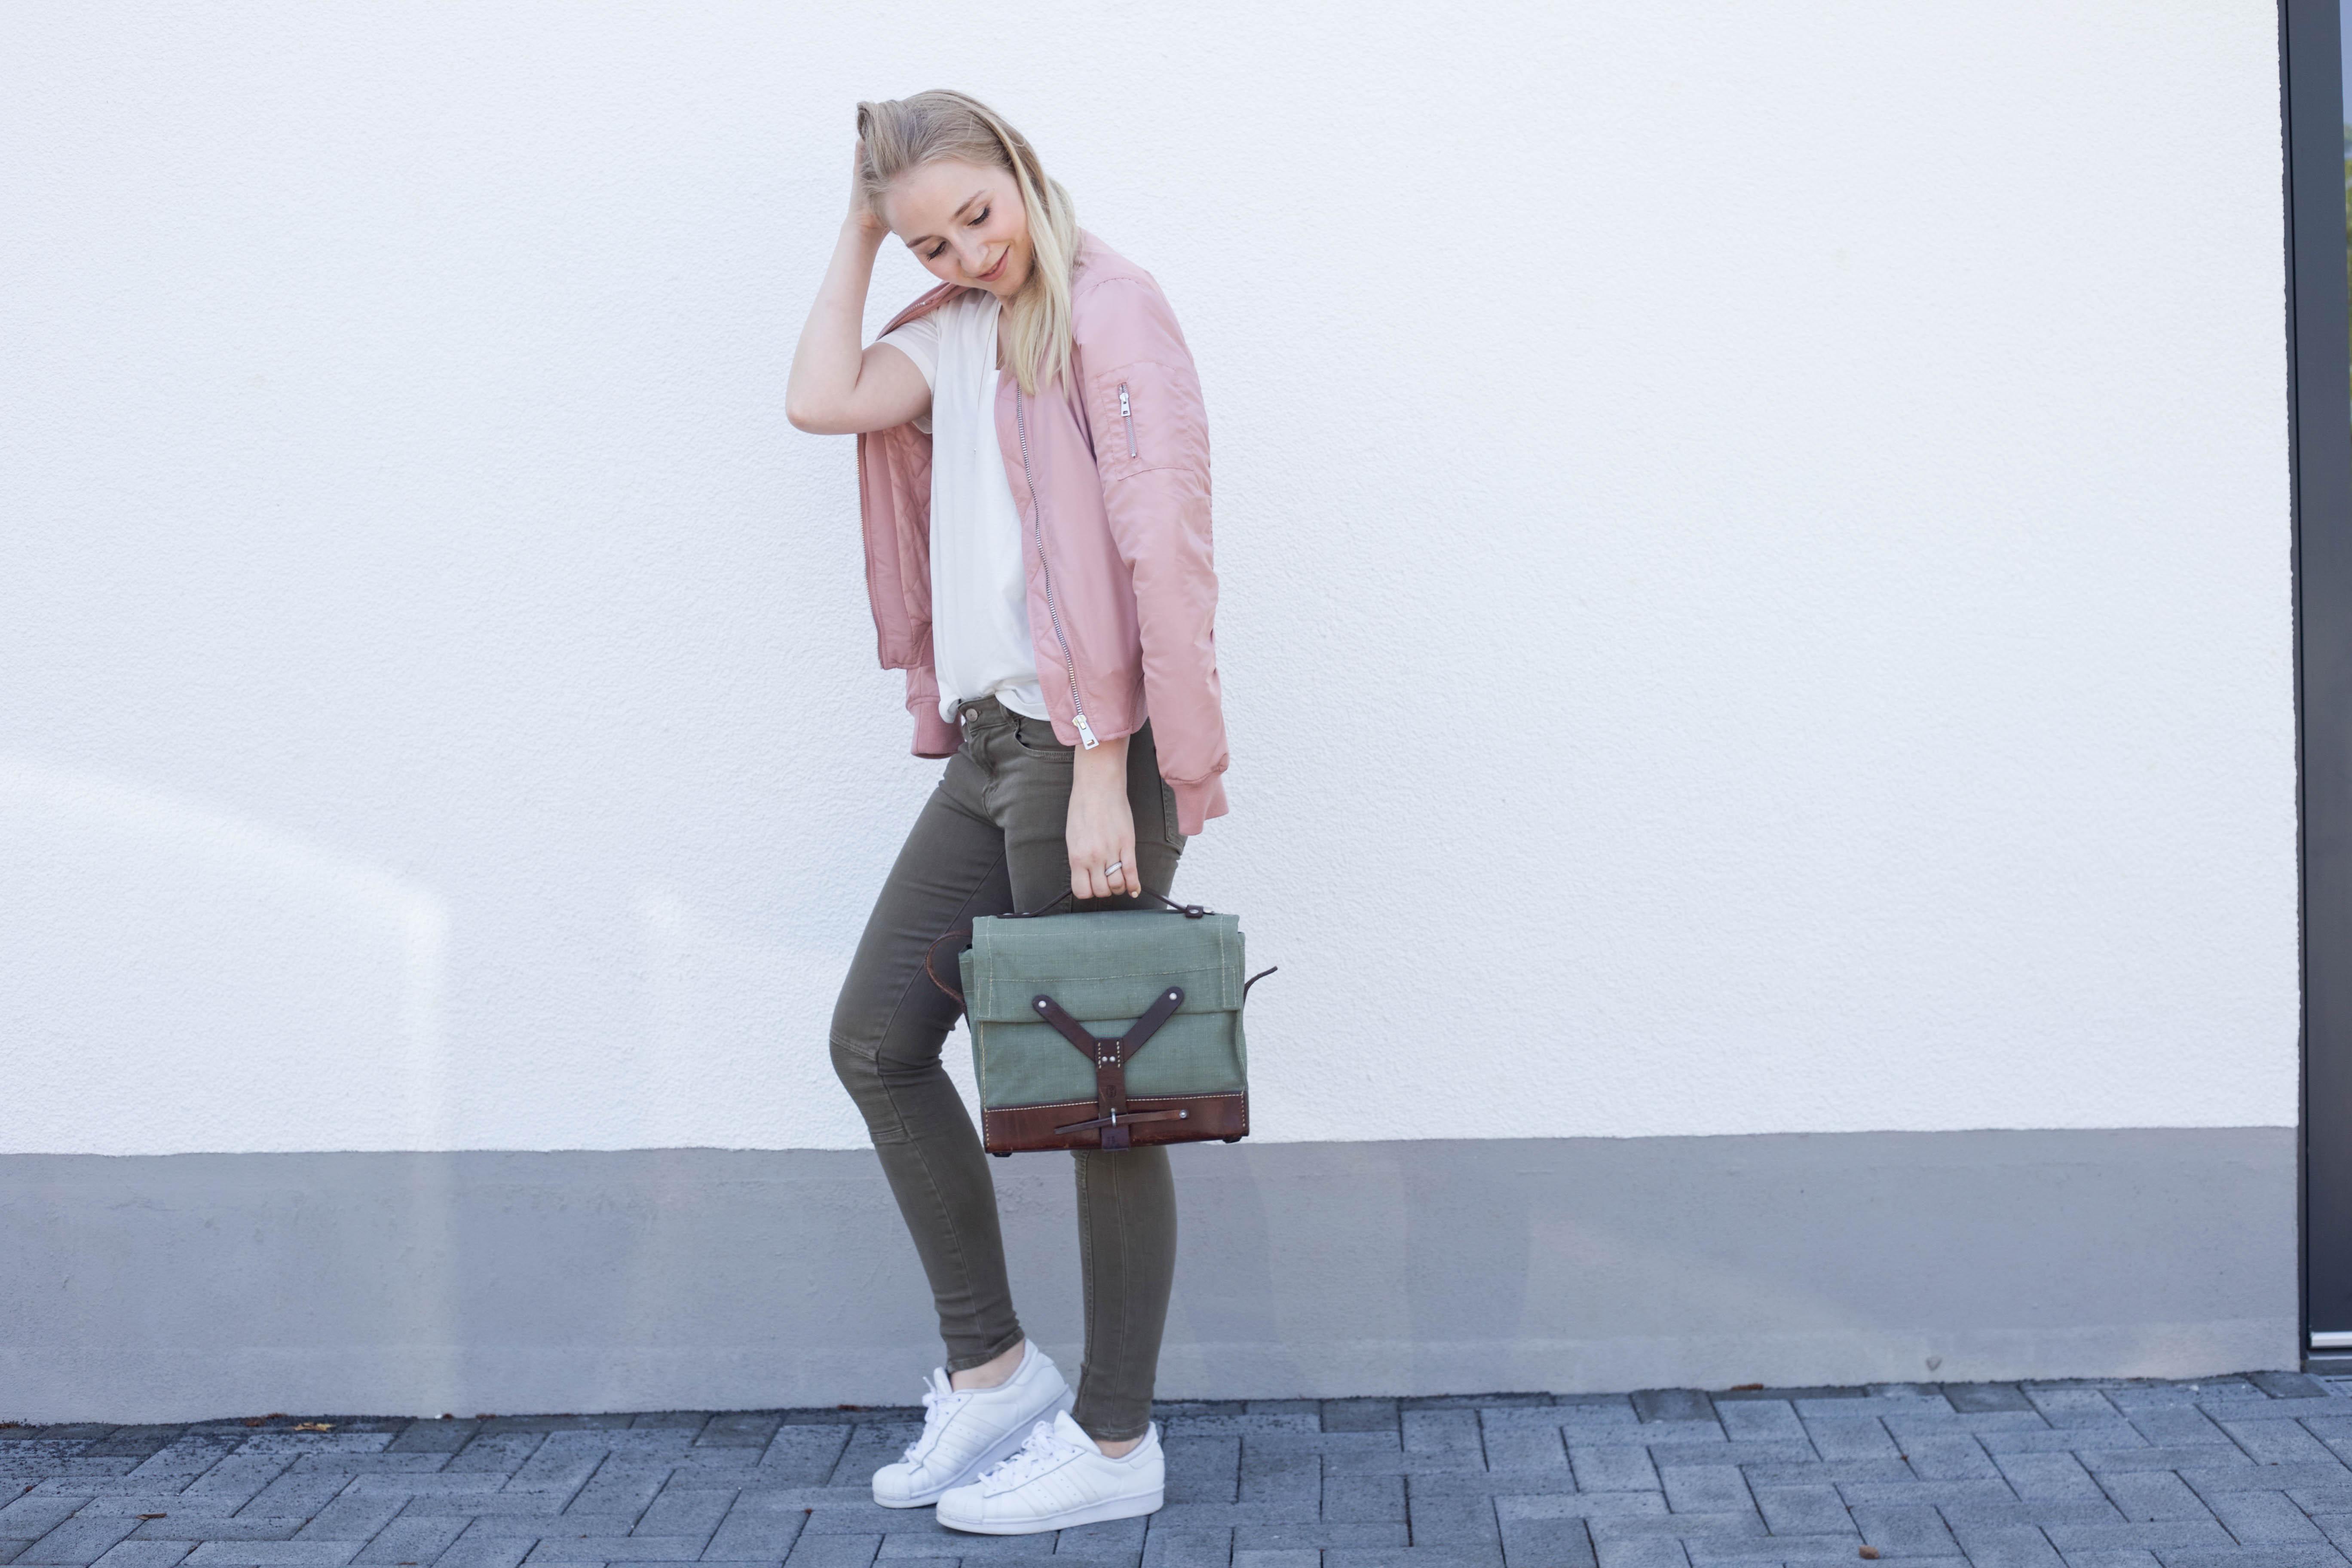 rosa-bomberjacke-weiße-sneaker-adidas superstars-outfit-fashionblog-cologne-berlin_0831